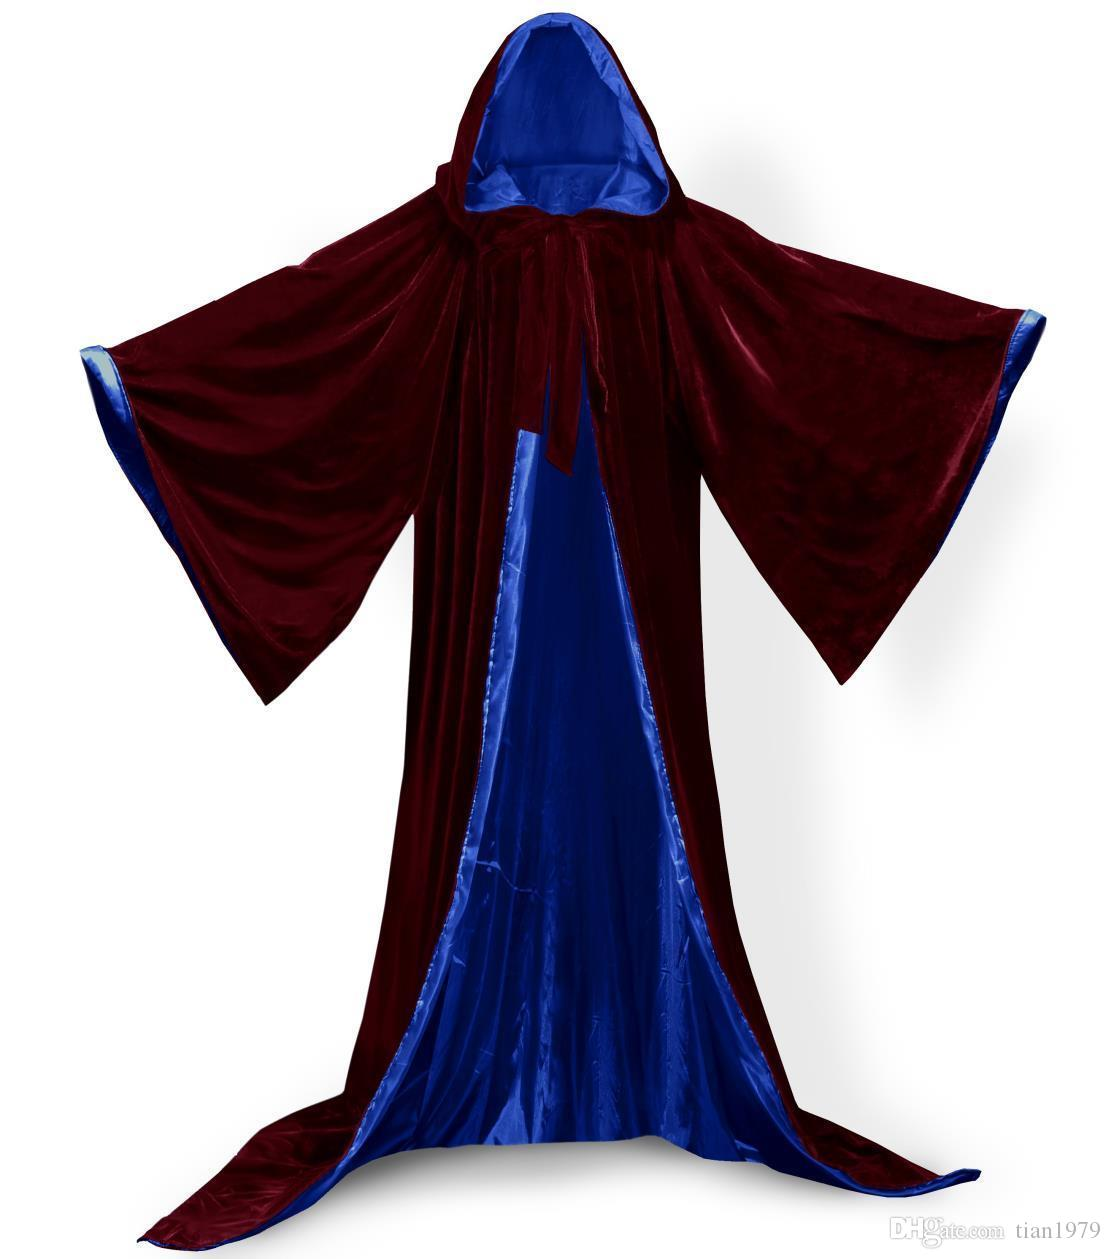 Long Sleeves Velvet Hooded Cloak Wedding Cape Halloween Wicca Christmas Hooded Cape Winter Wedding Cloak For Kids Junior Bridesmaid Warm Fur